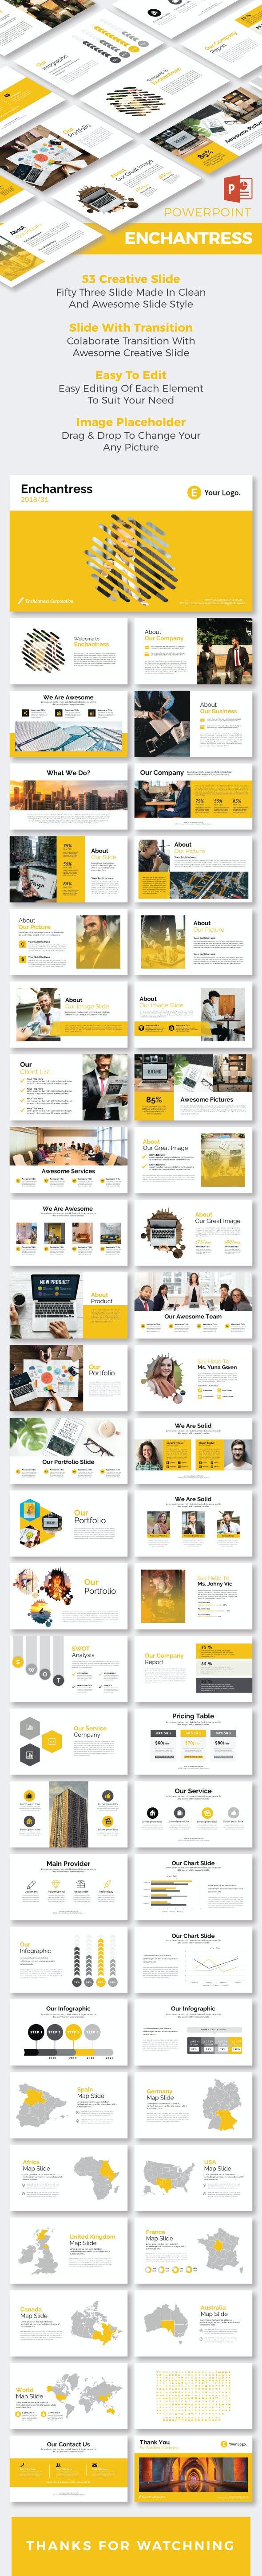 Enchantress Google Slide Pptx - Google Slides Presentation Templates